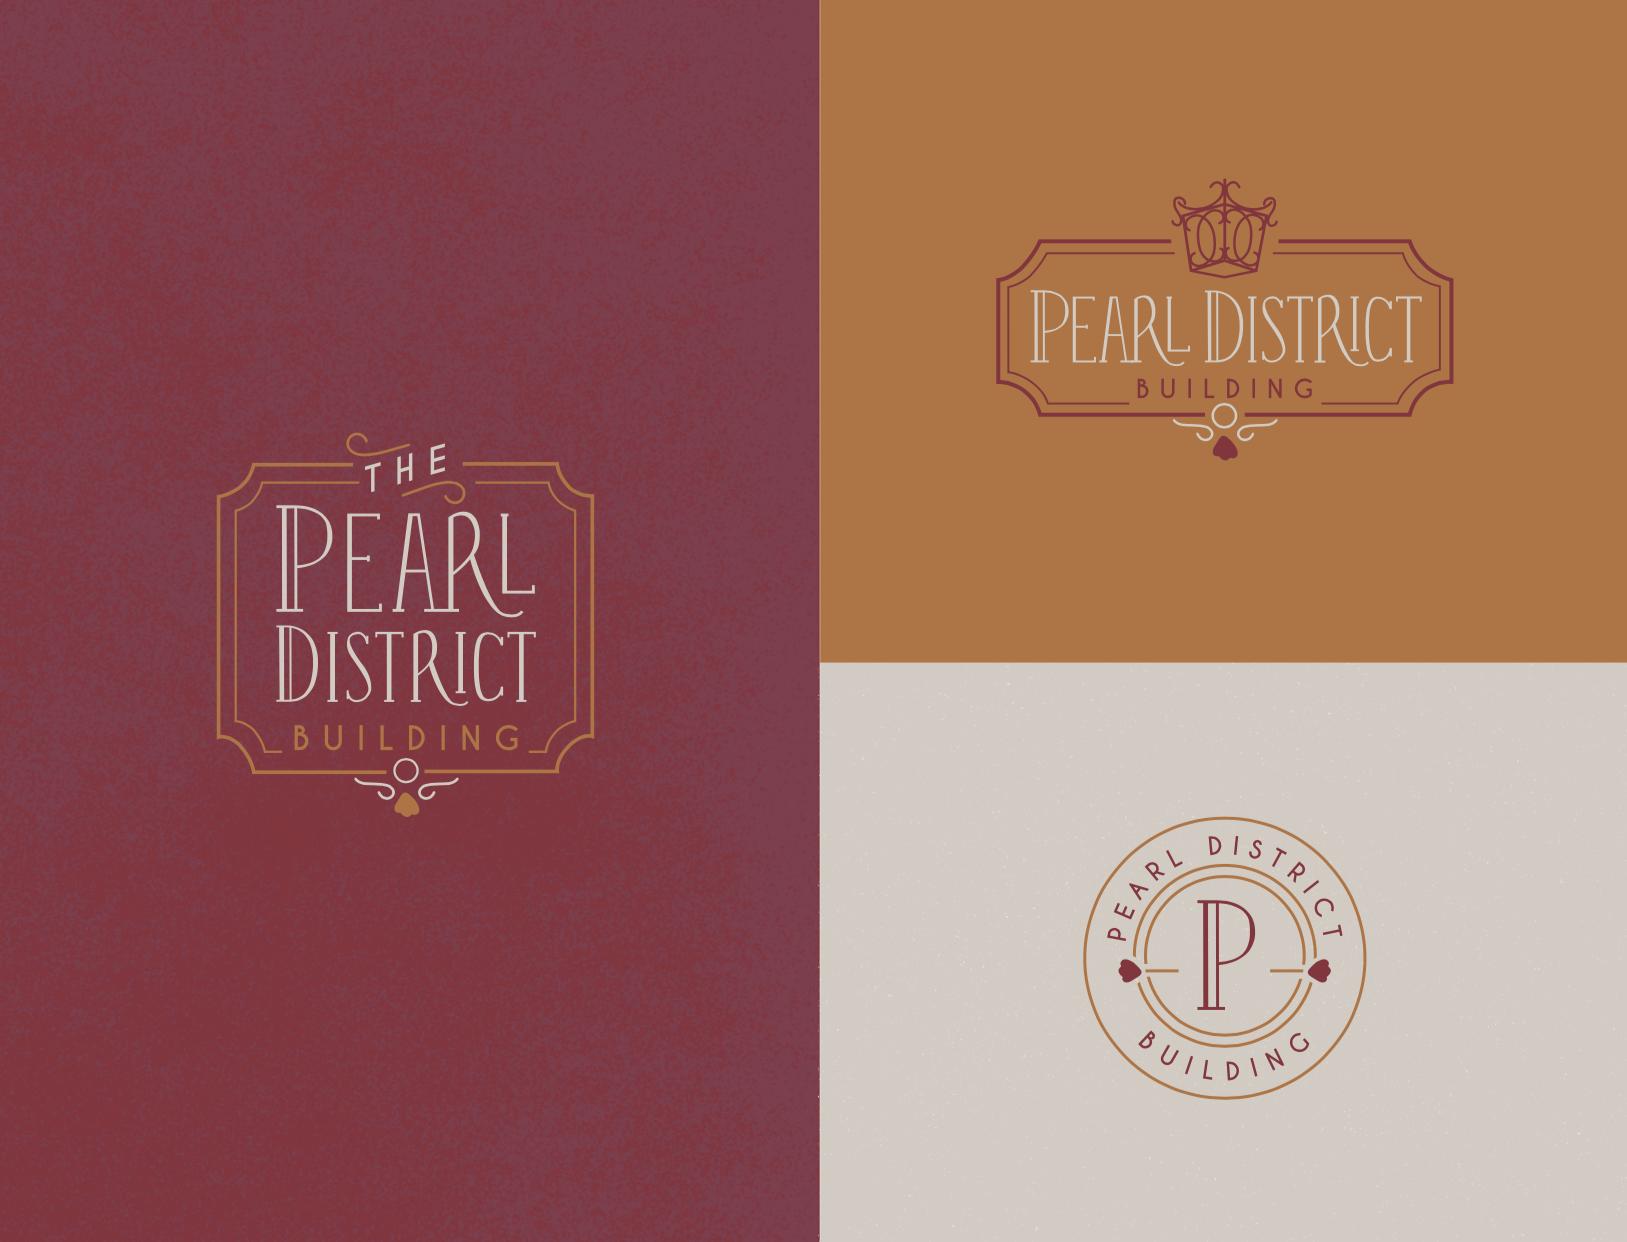 Pearl District Building-Tulsa-WeddingVenue-Branding-Speakeasy-Urban-ElegantLogo